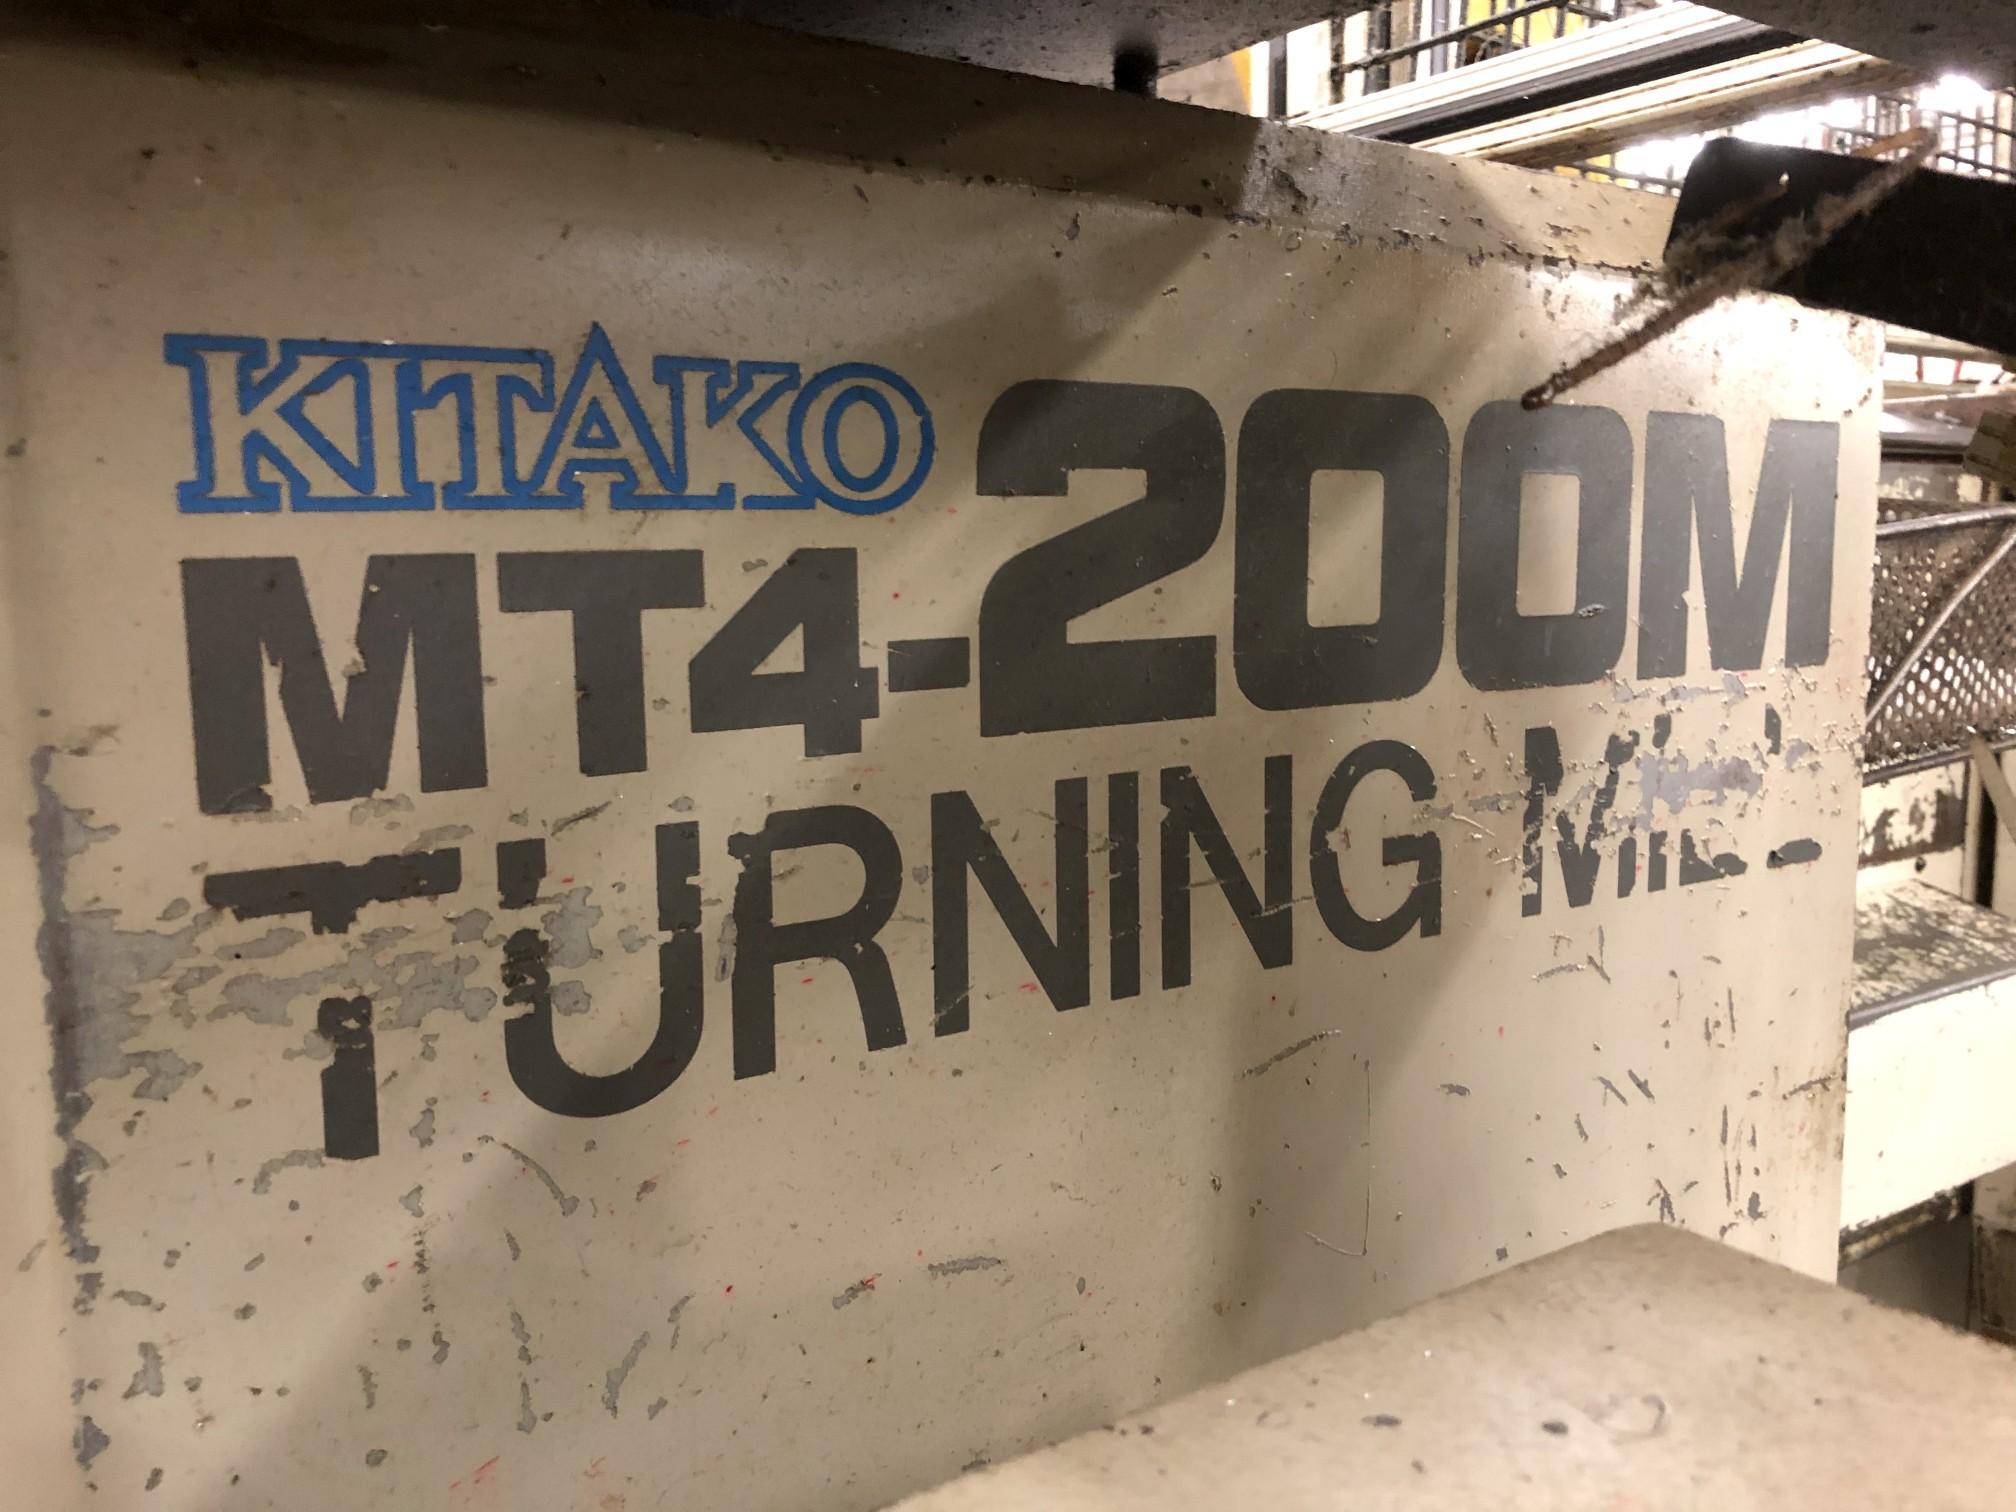 1999 Kitako MT4-200M Multi-Spindle CNC Turning Mill - Image 4 of 19